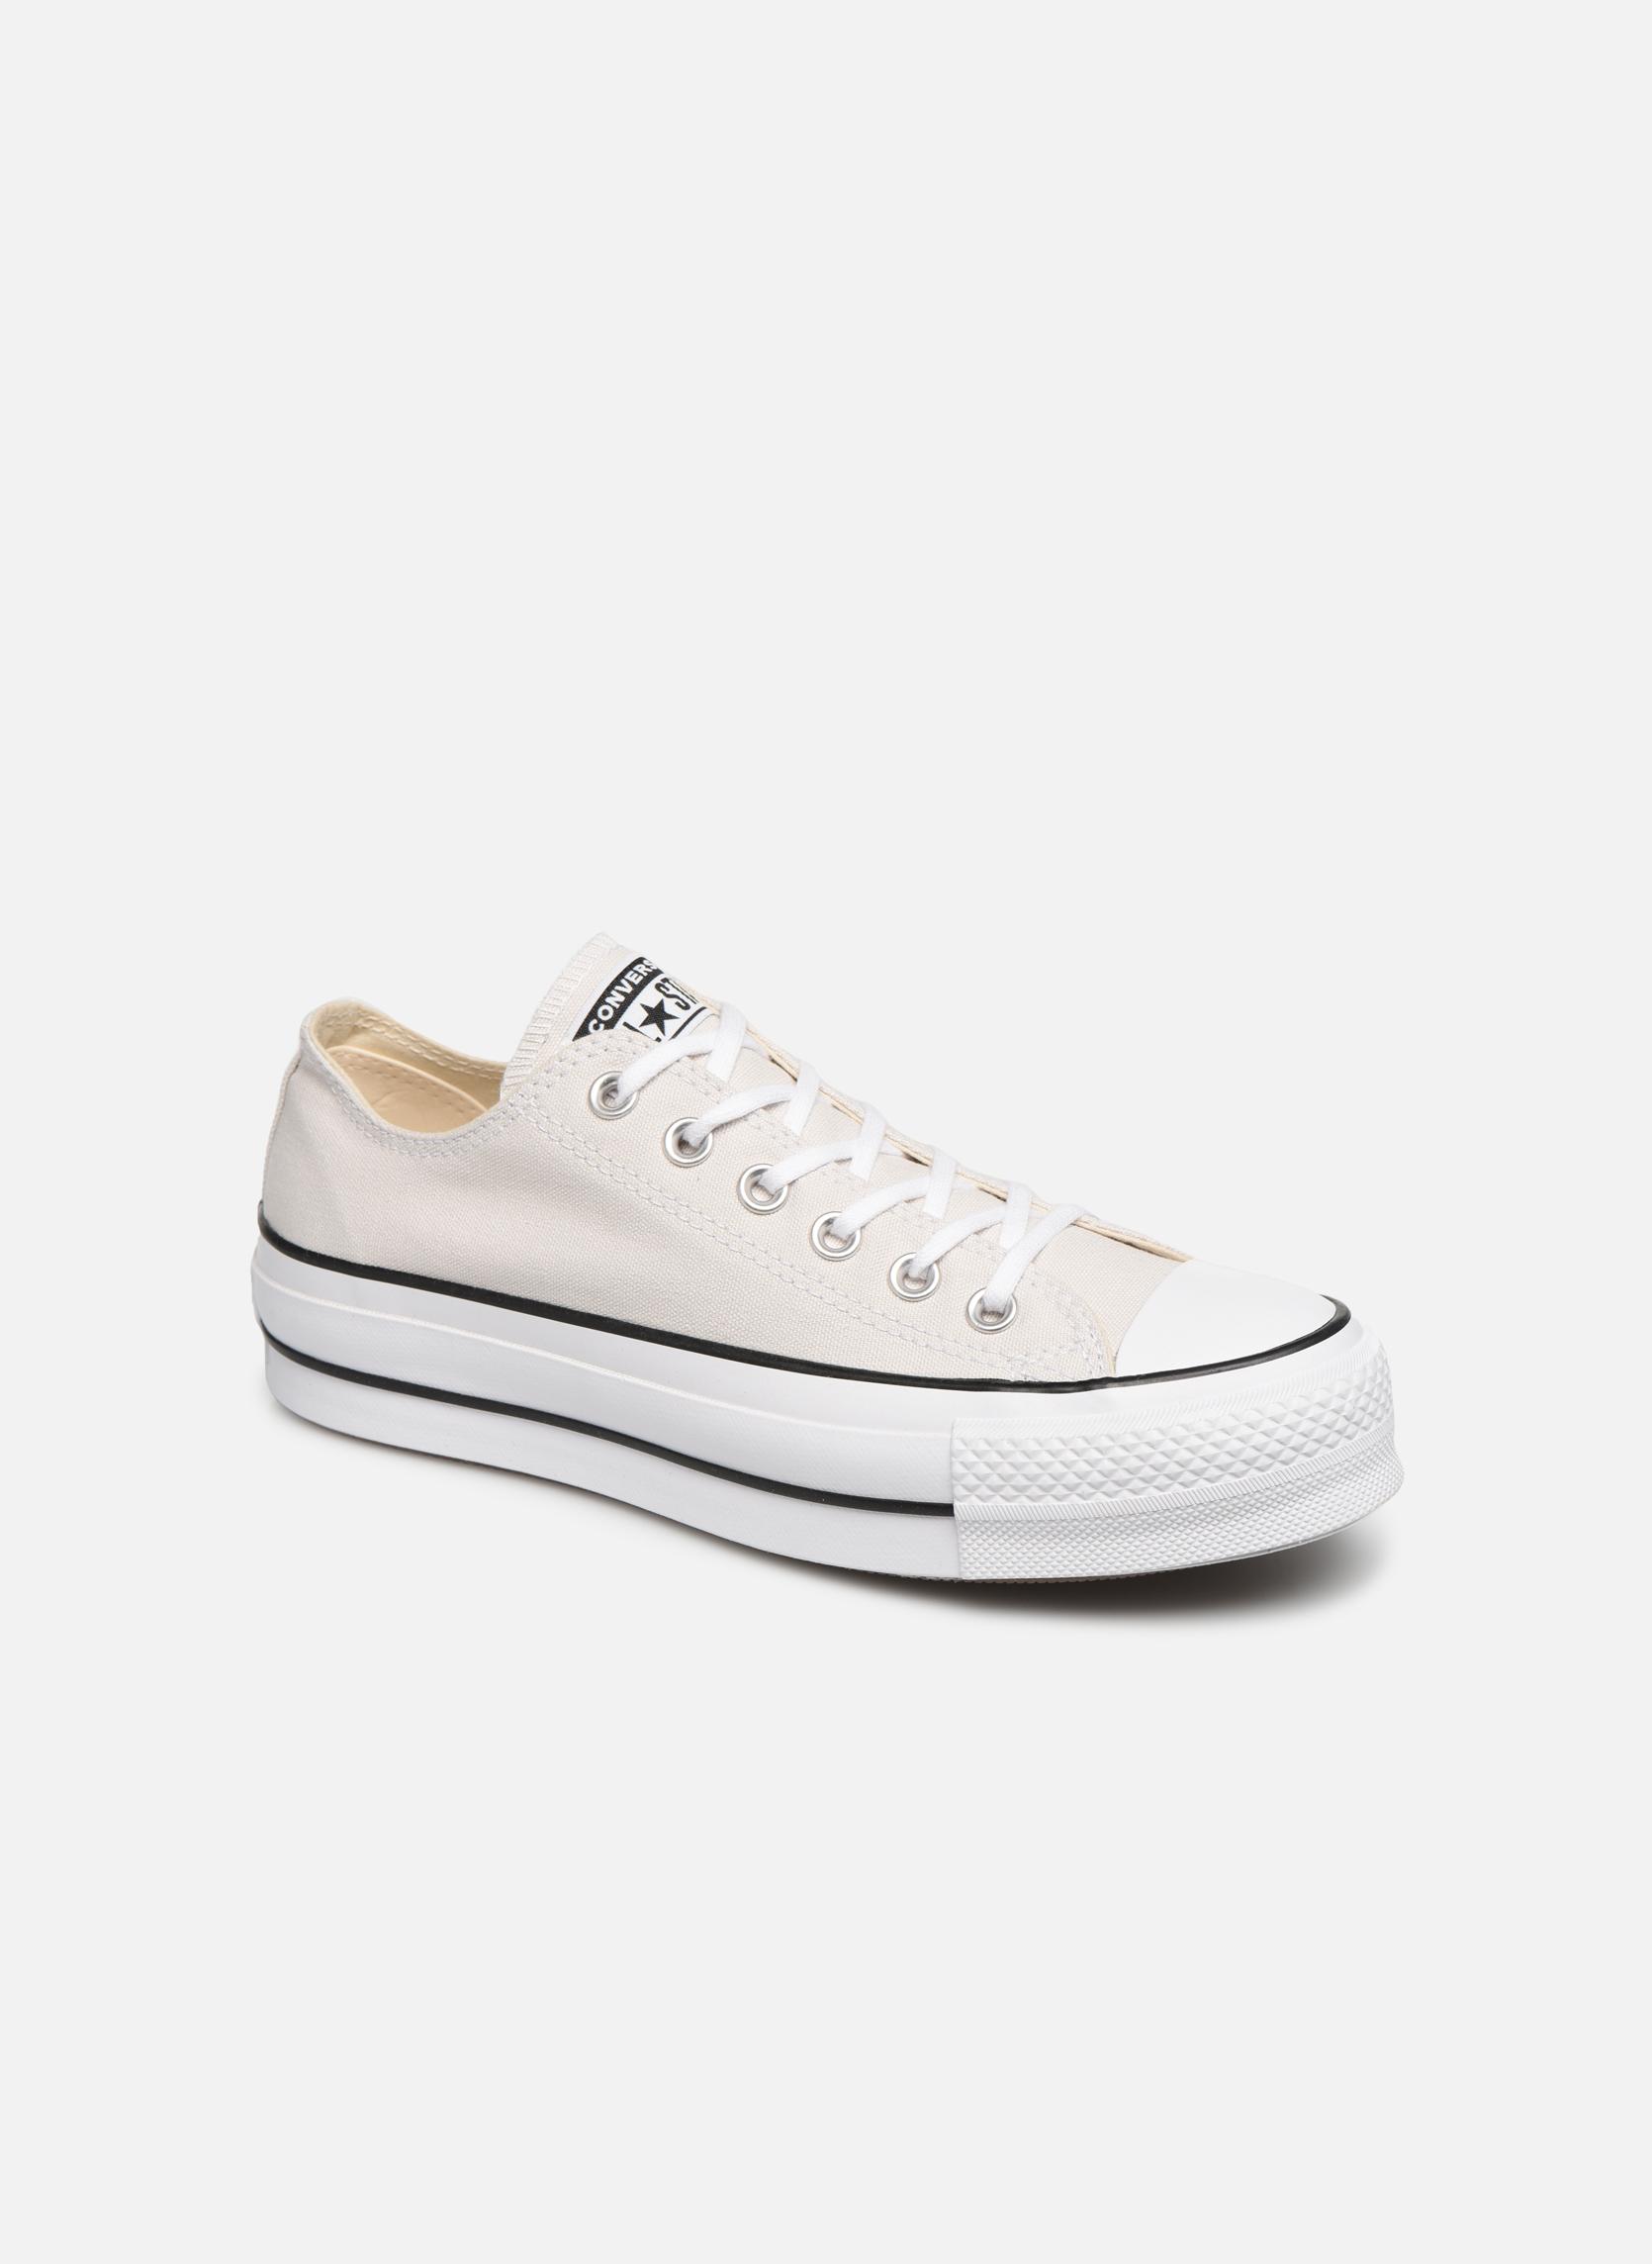 Beige Sneakers van Converse maat 38 Tot € 200